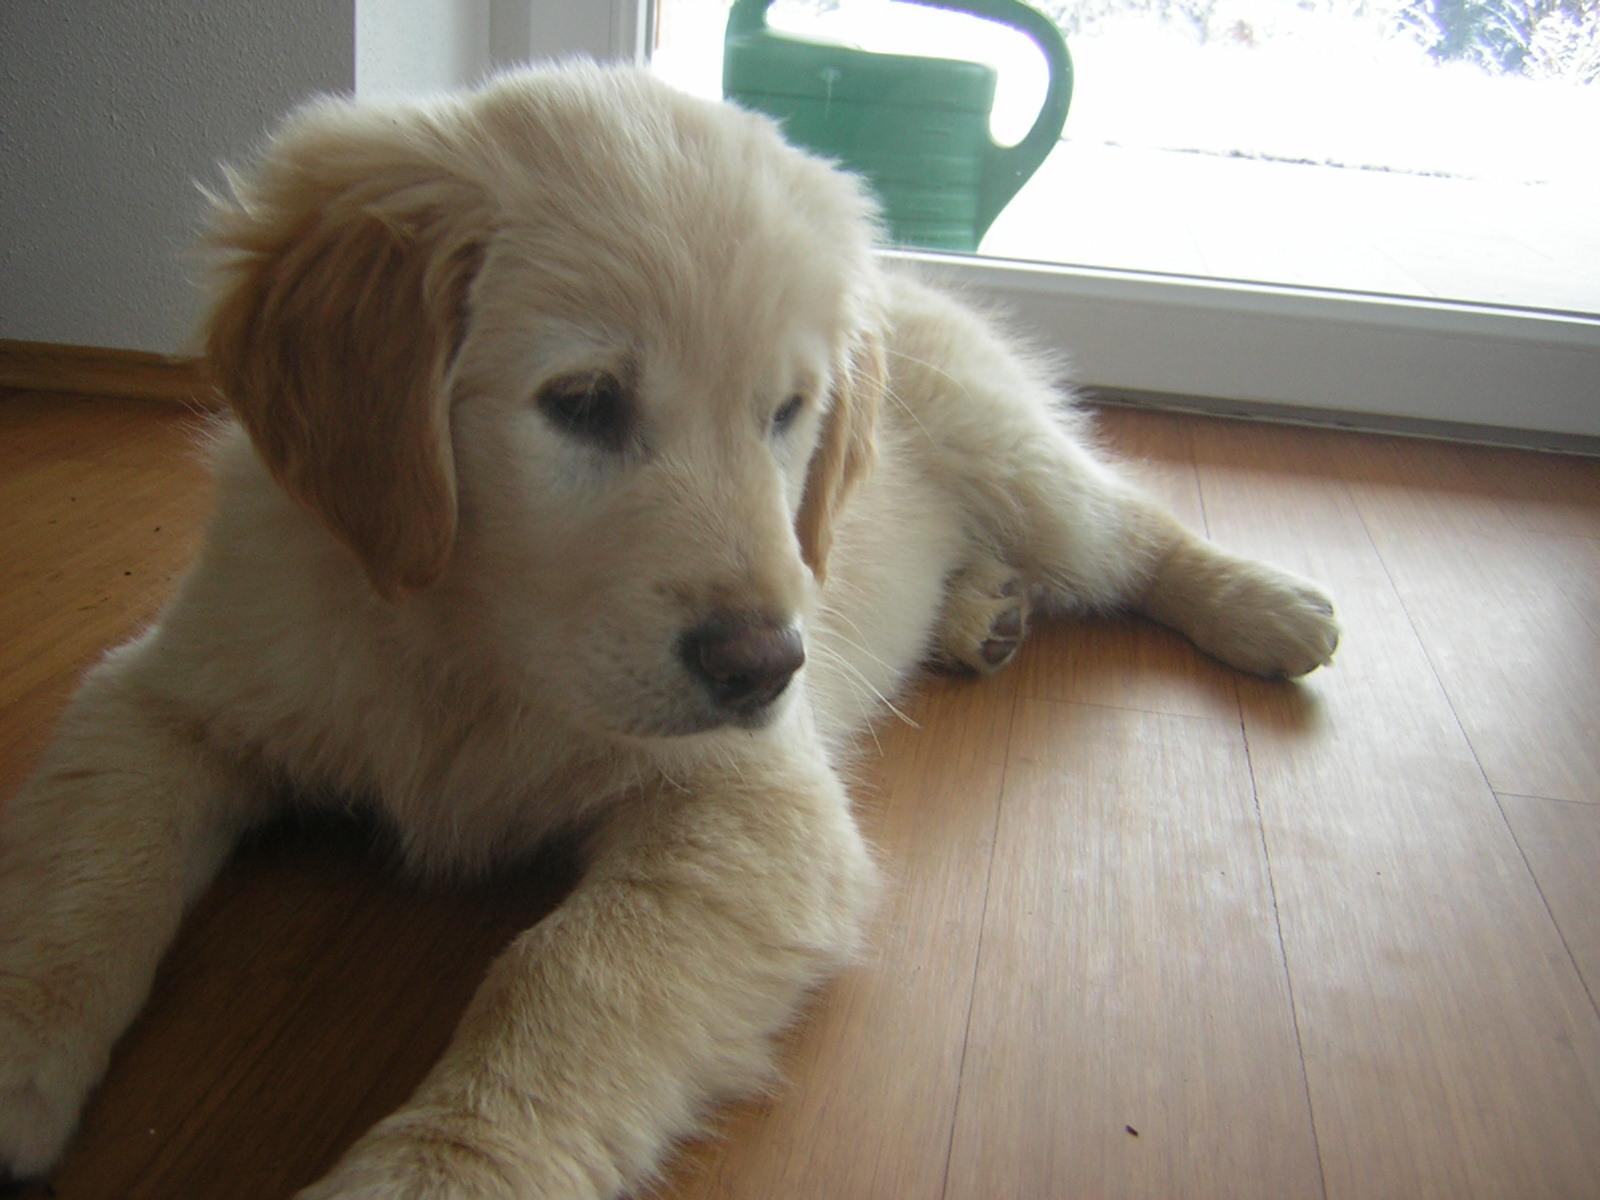 File:Golden Retriever Puppy 12weeks.JPG - Wikipedia, the free ...